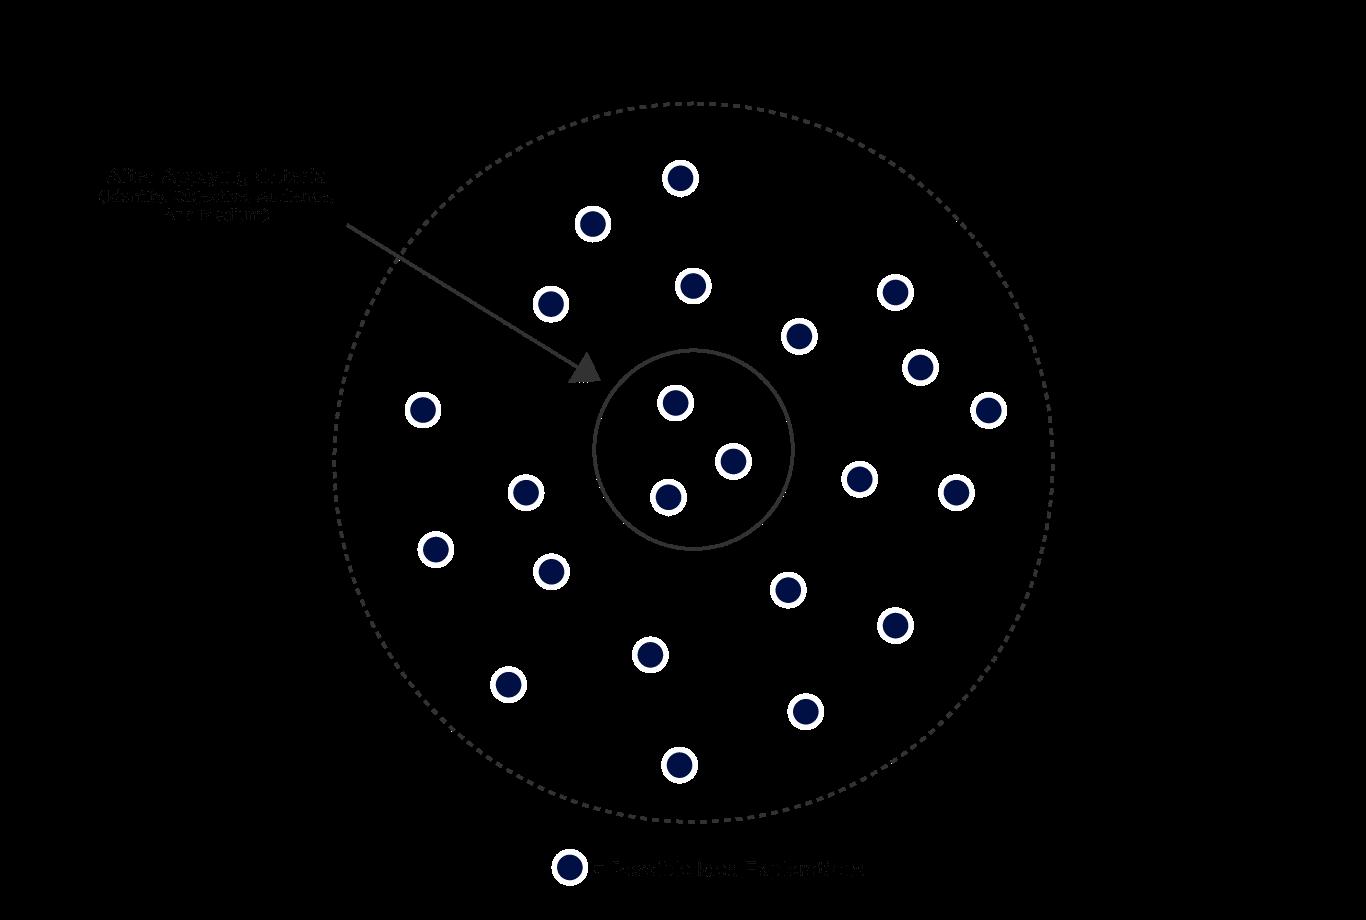 Graphic depicting idea explorations